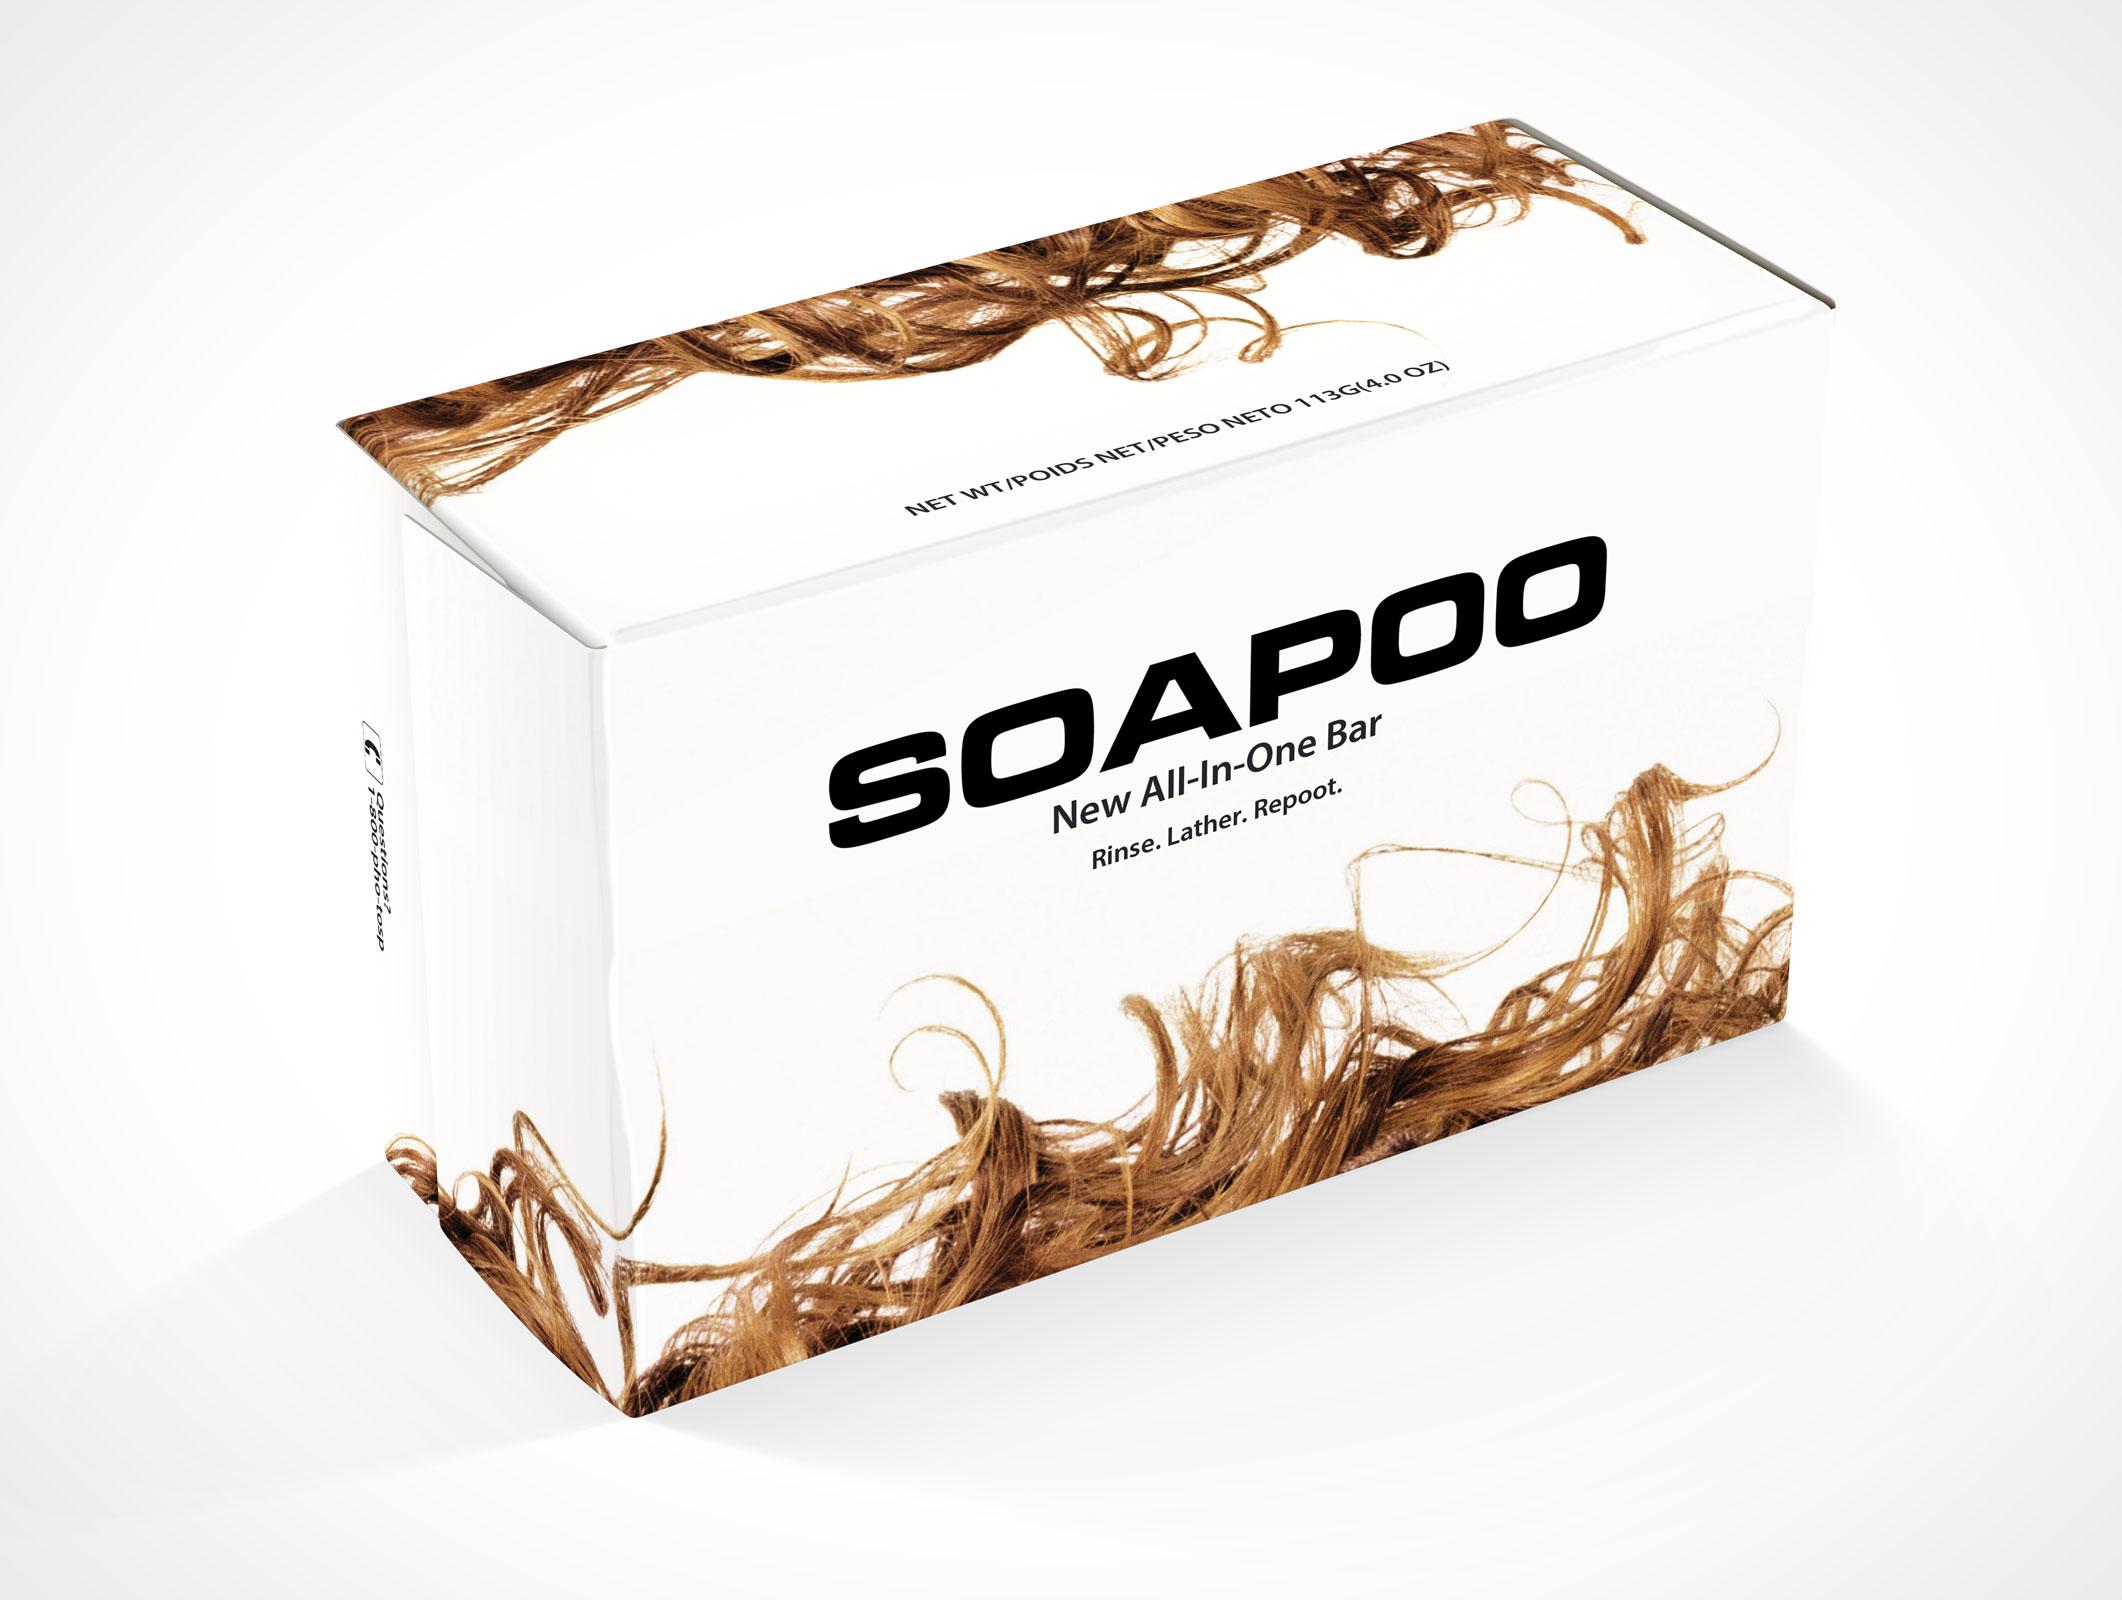 SOAPBOX002r3